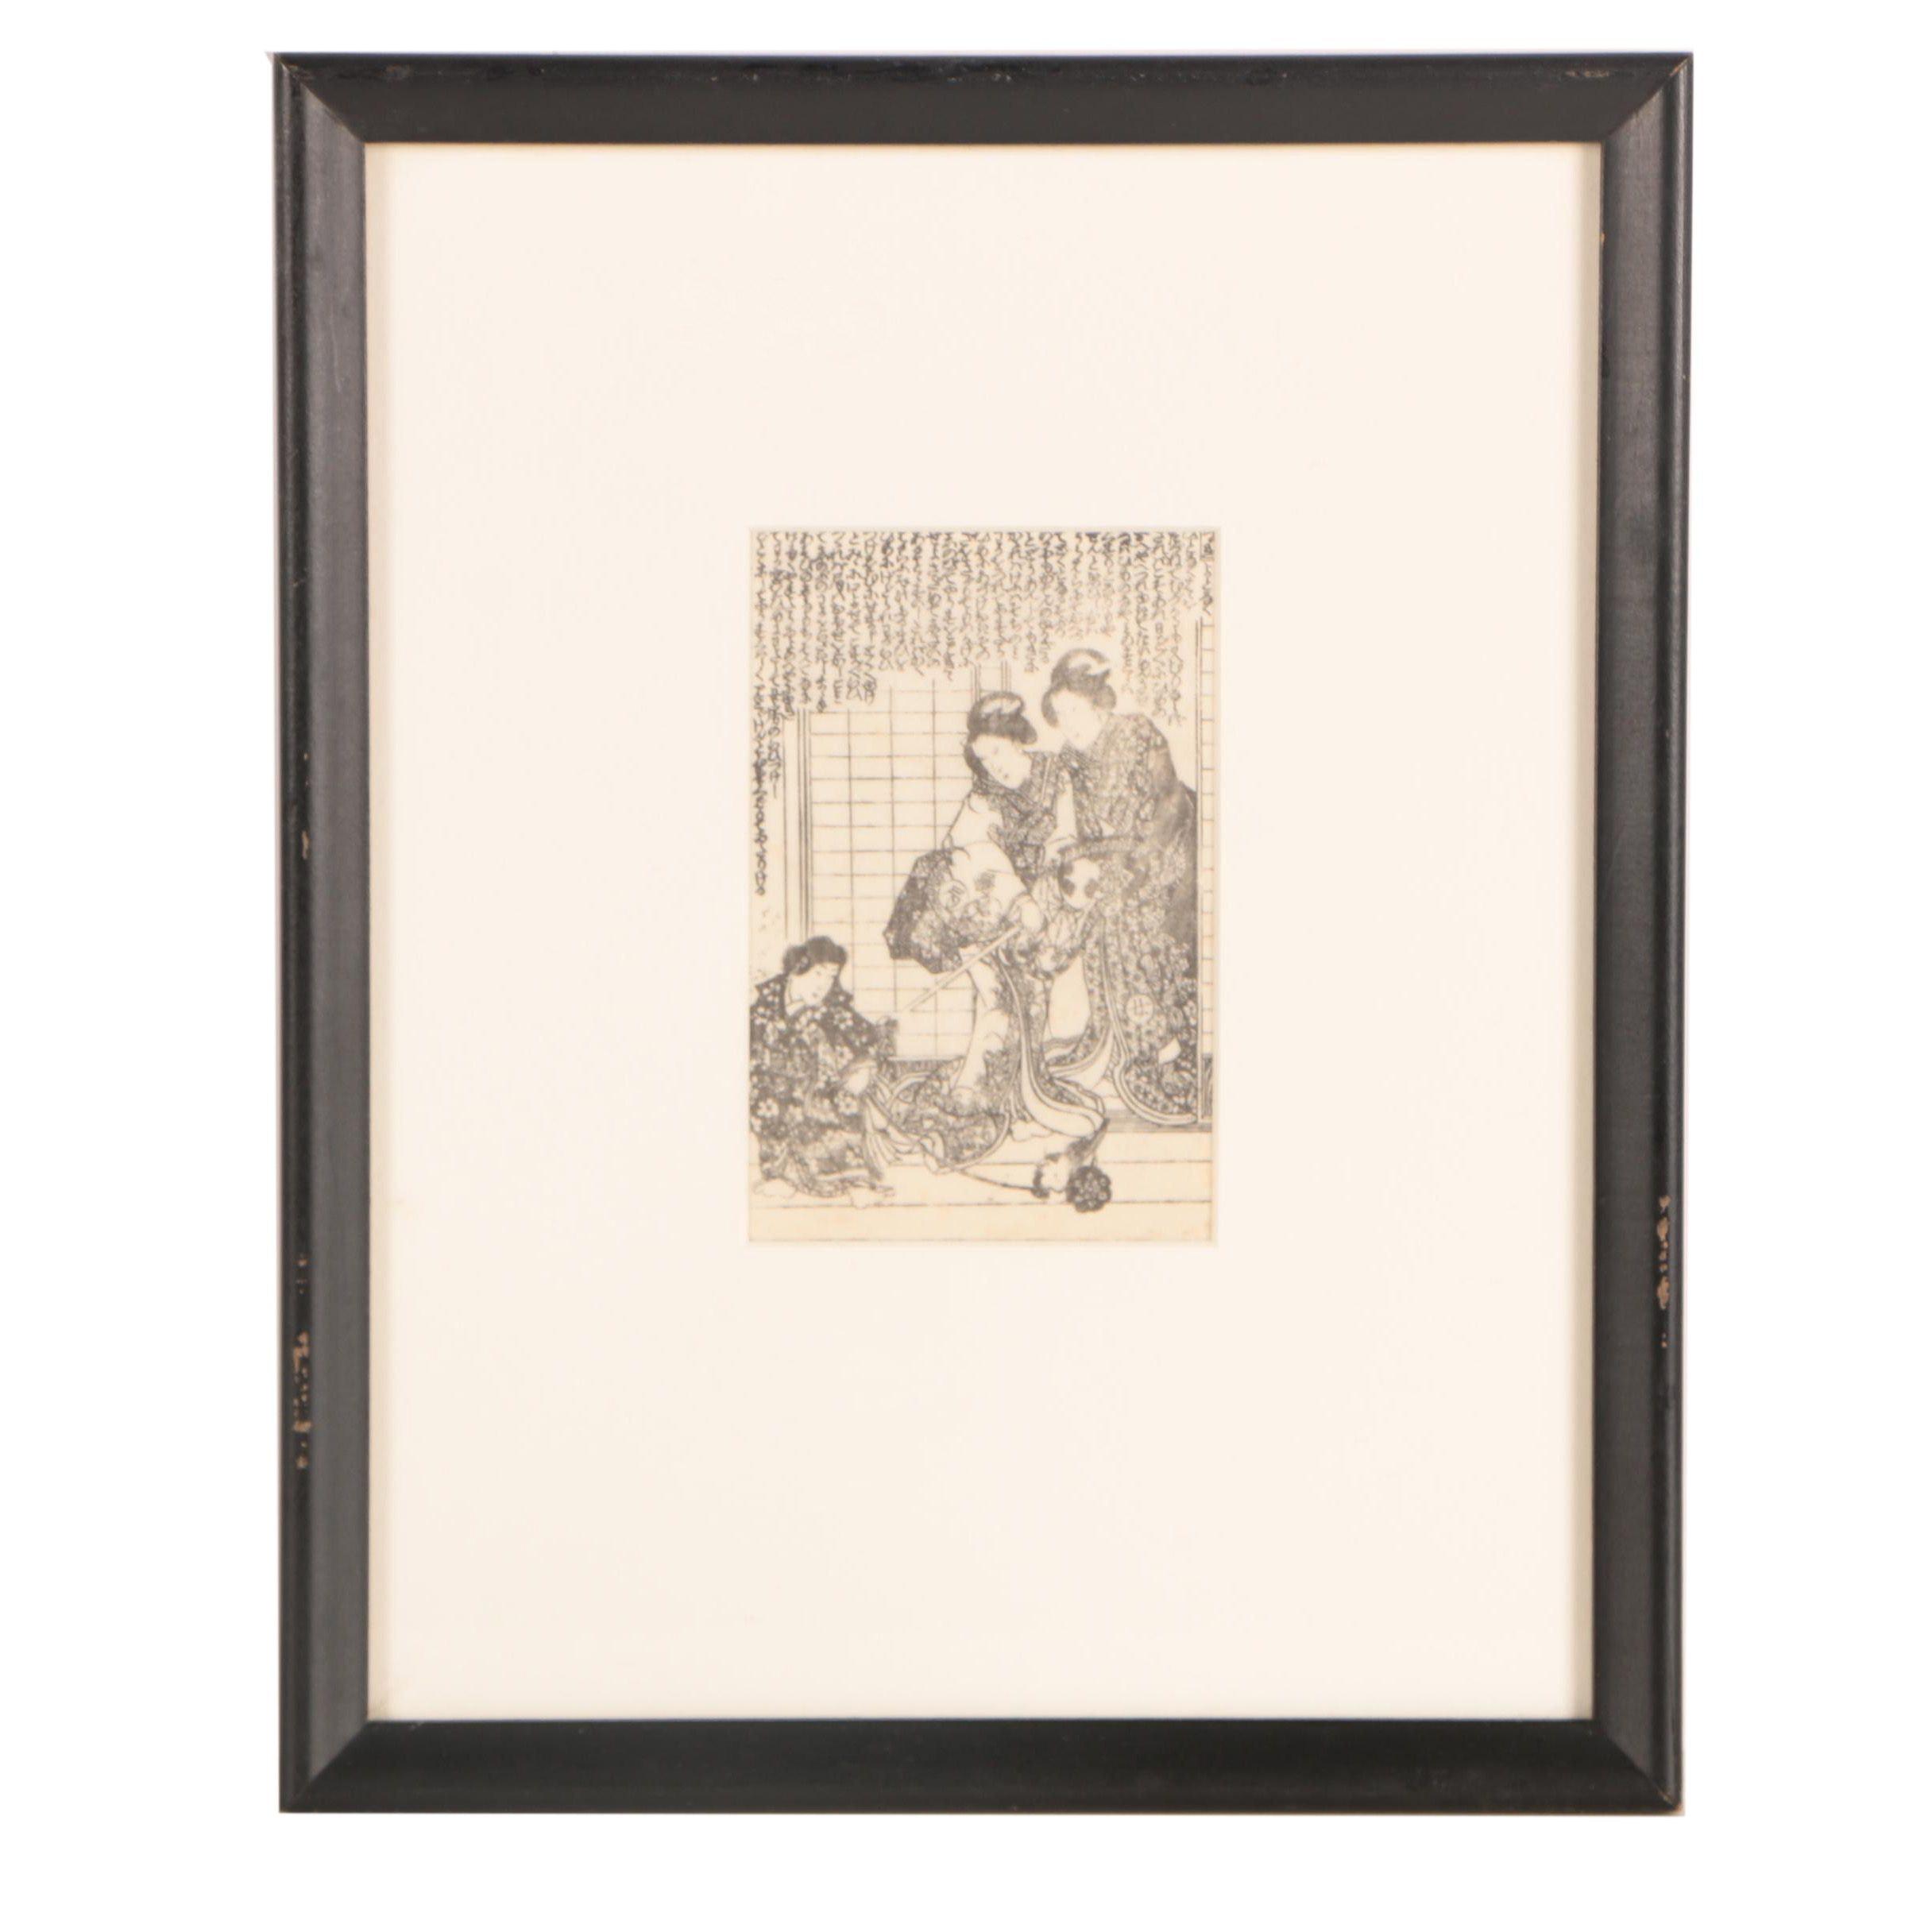 Page from Japanese Woodblock Printed Book Attributed to Utagawa Kunisada